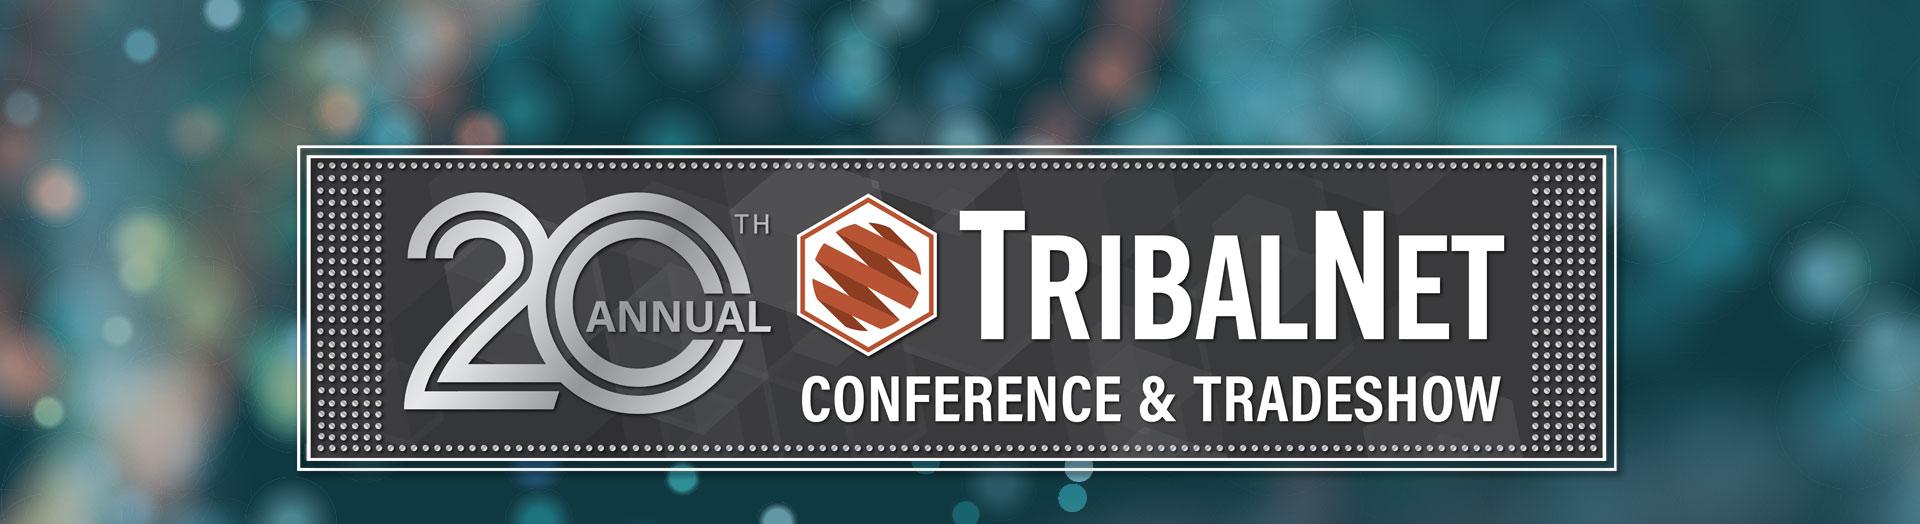 TribalNet Conference & Tradeshow Details